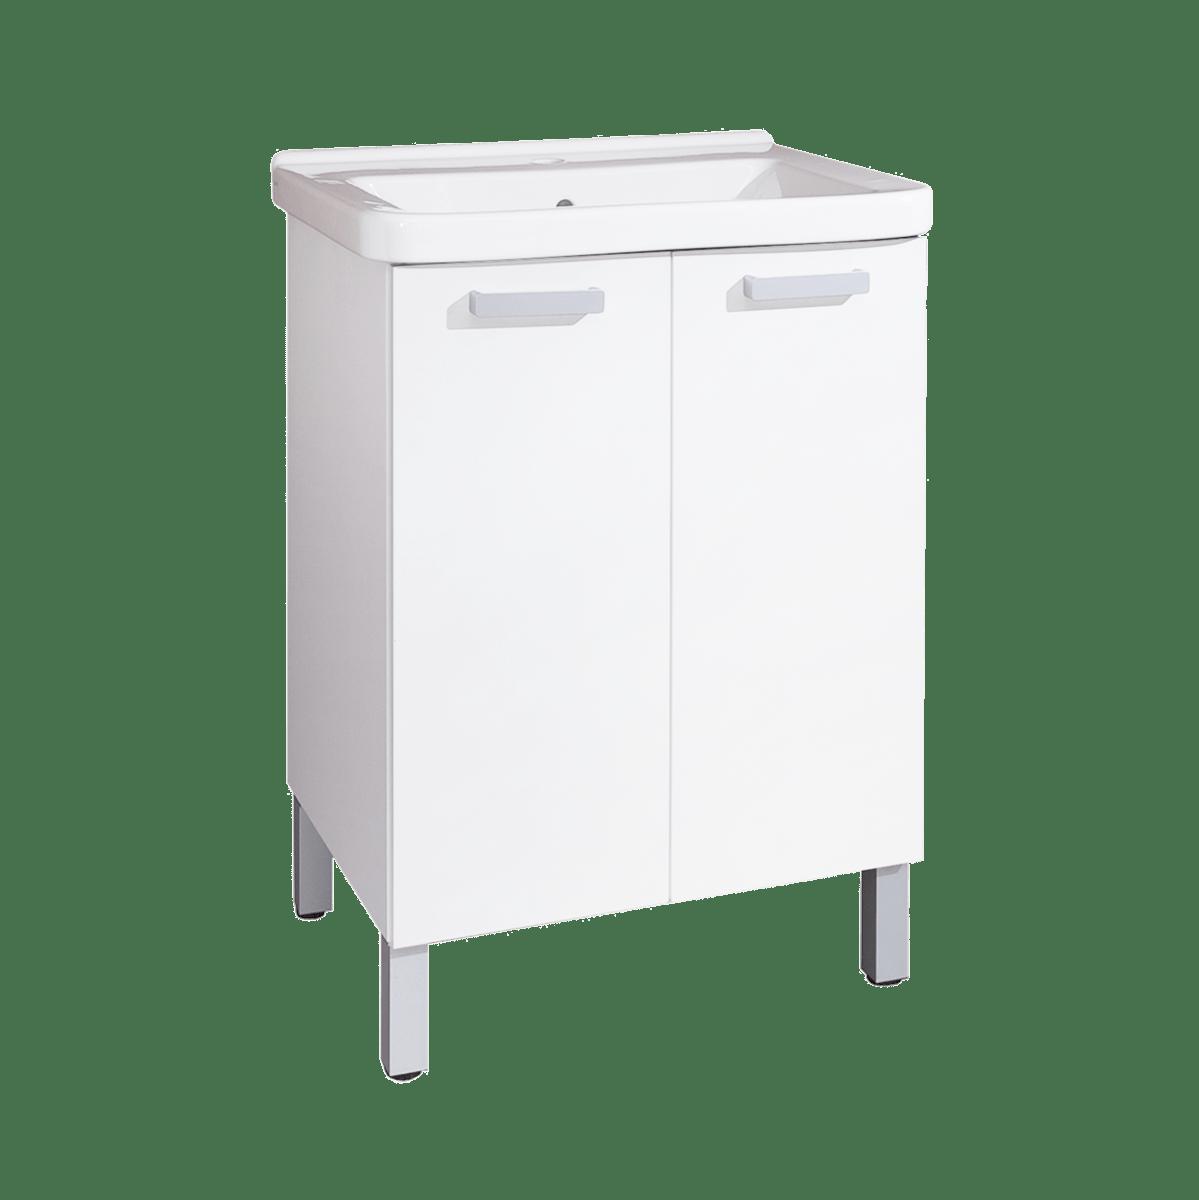 Kúpeľňová skrinka s umývadlom Naturel Vario 65x48,5 cm biela VARIO65BIBL